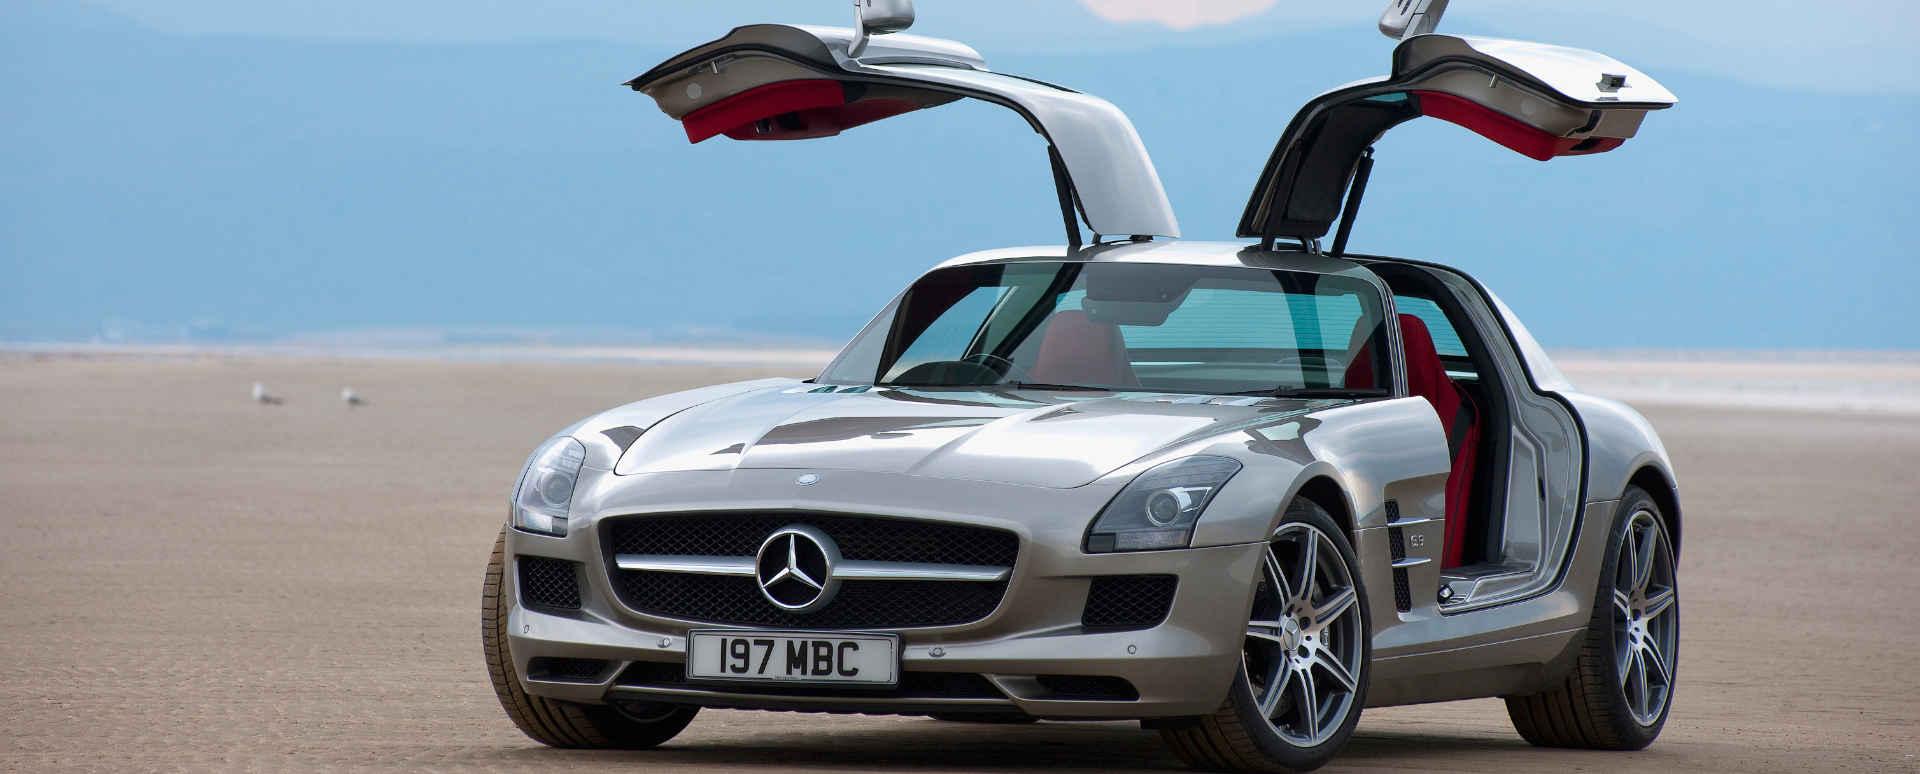 Mercedes-AMG SLS Large Carousel